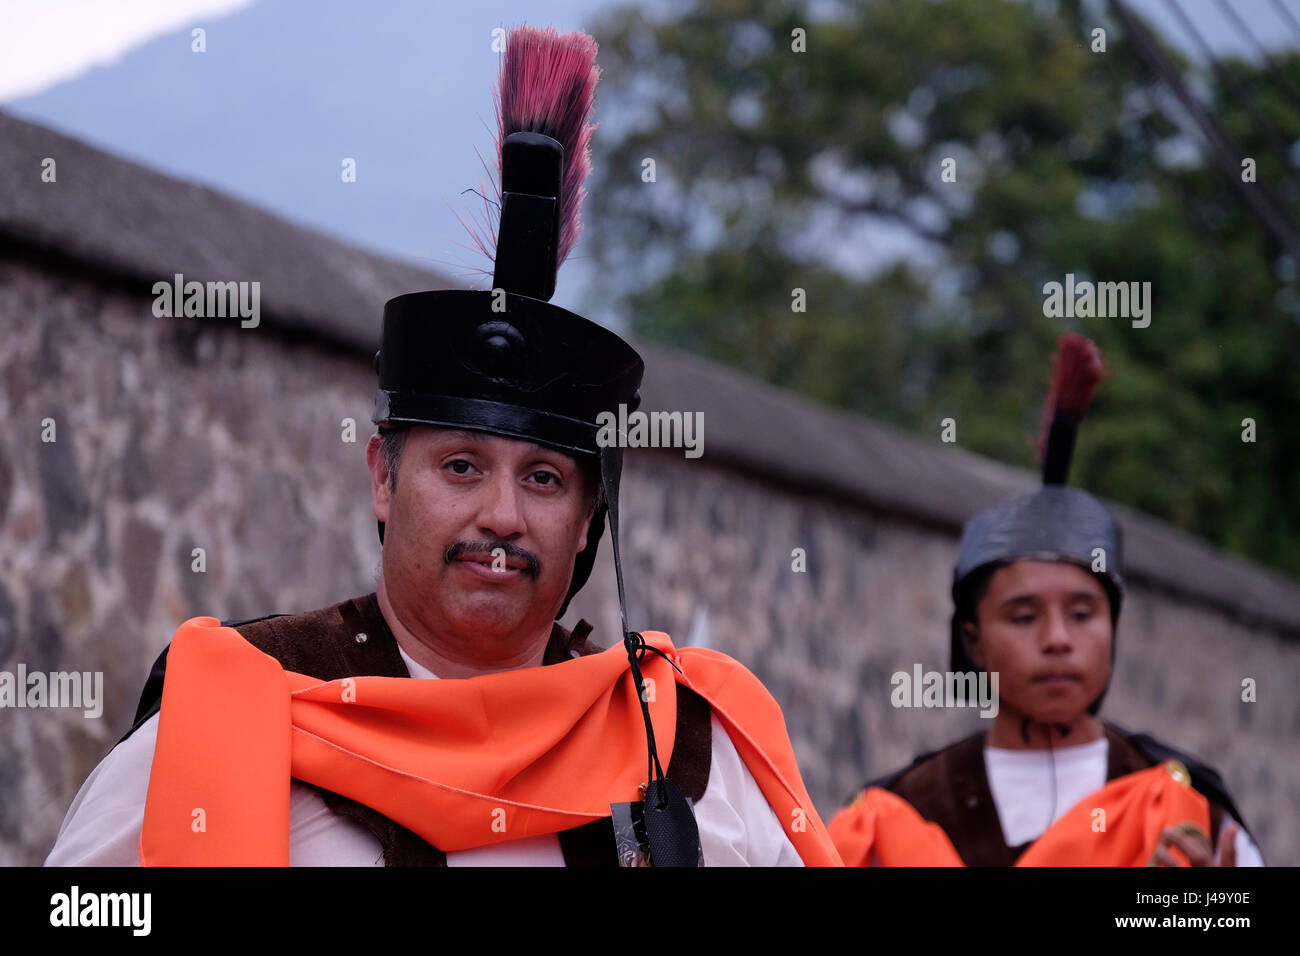 People dressed as Roman warrior during Semana Santa or Holy week celebration in the city of Antigua Guatemala - Stock Image